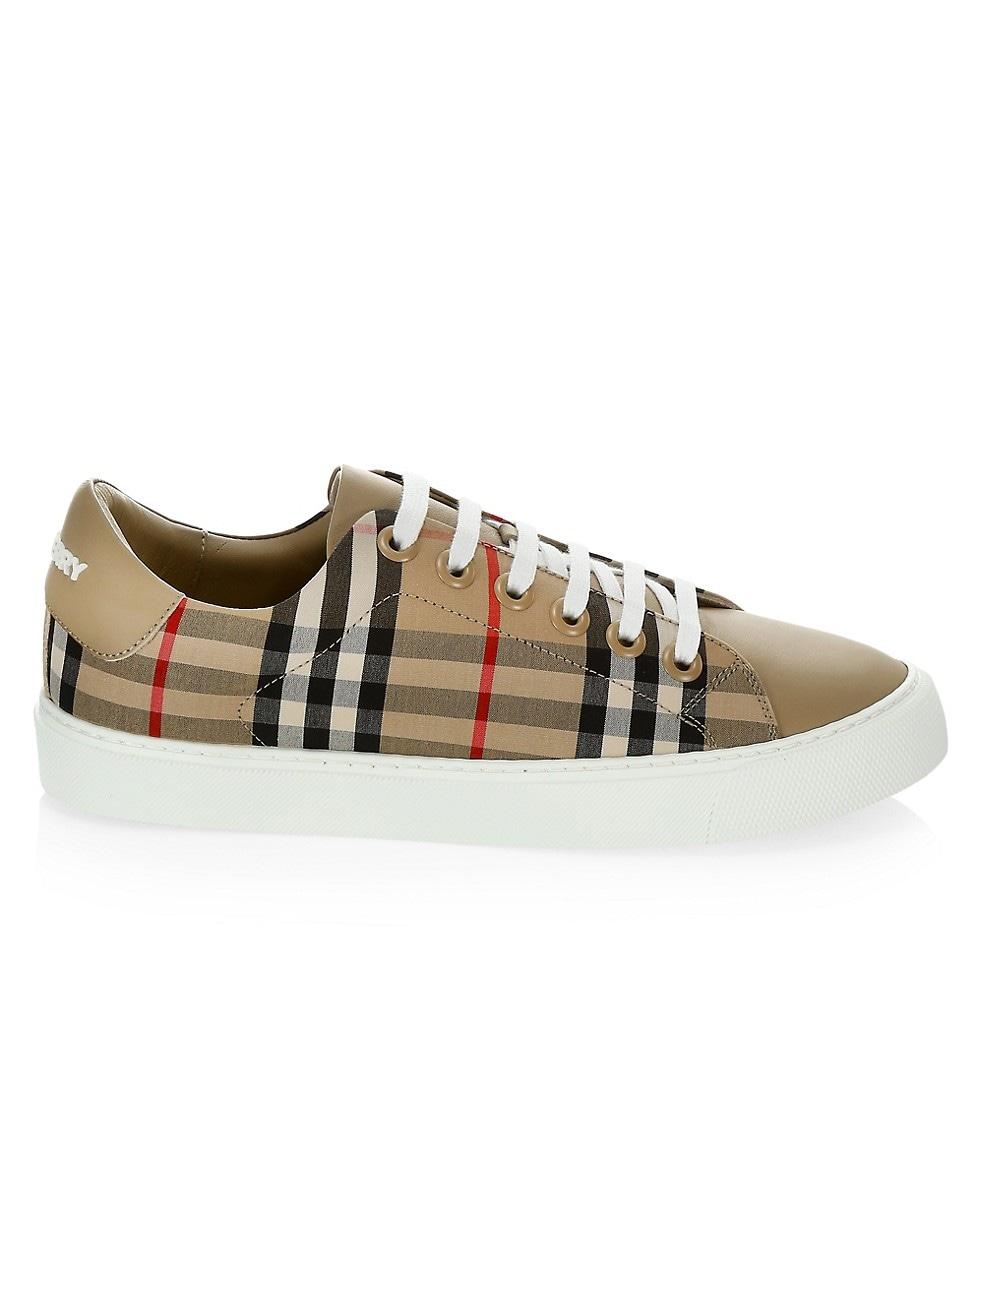 Burberry Albridge Vintage Check Sneakers